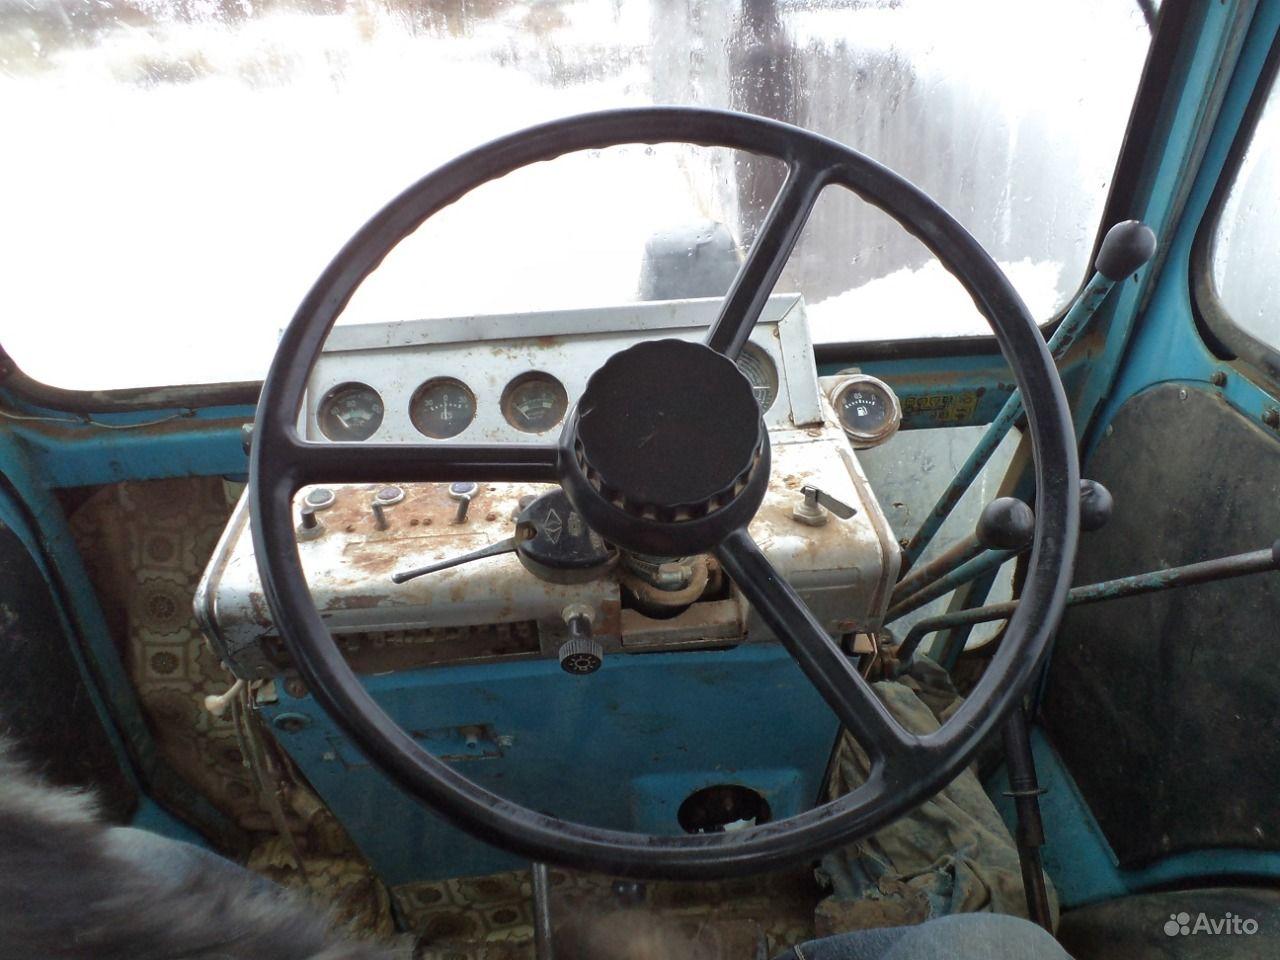 67 объявлений - Продажа б/у тракторов с пробегом, купить.